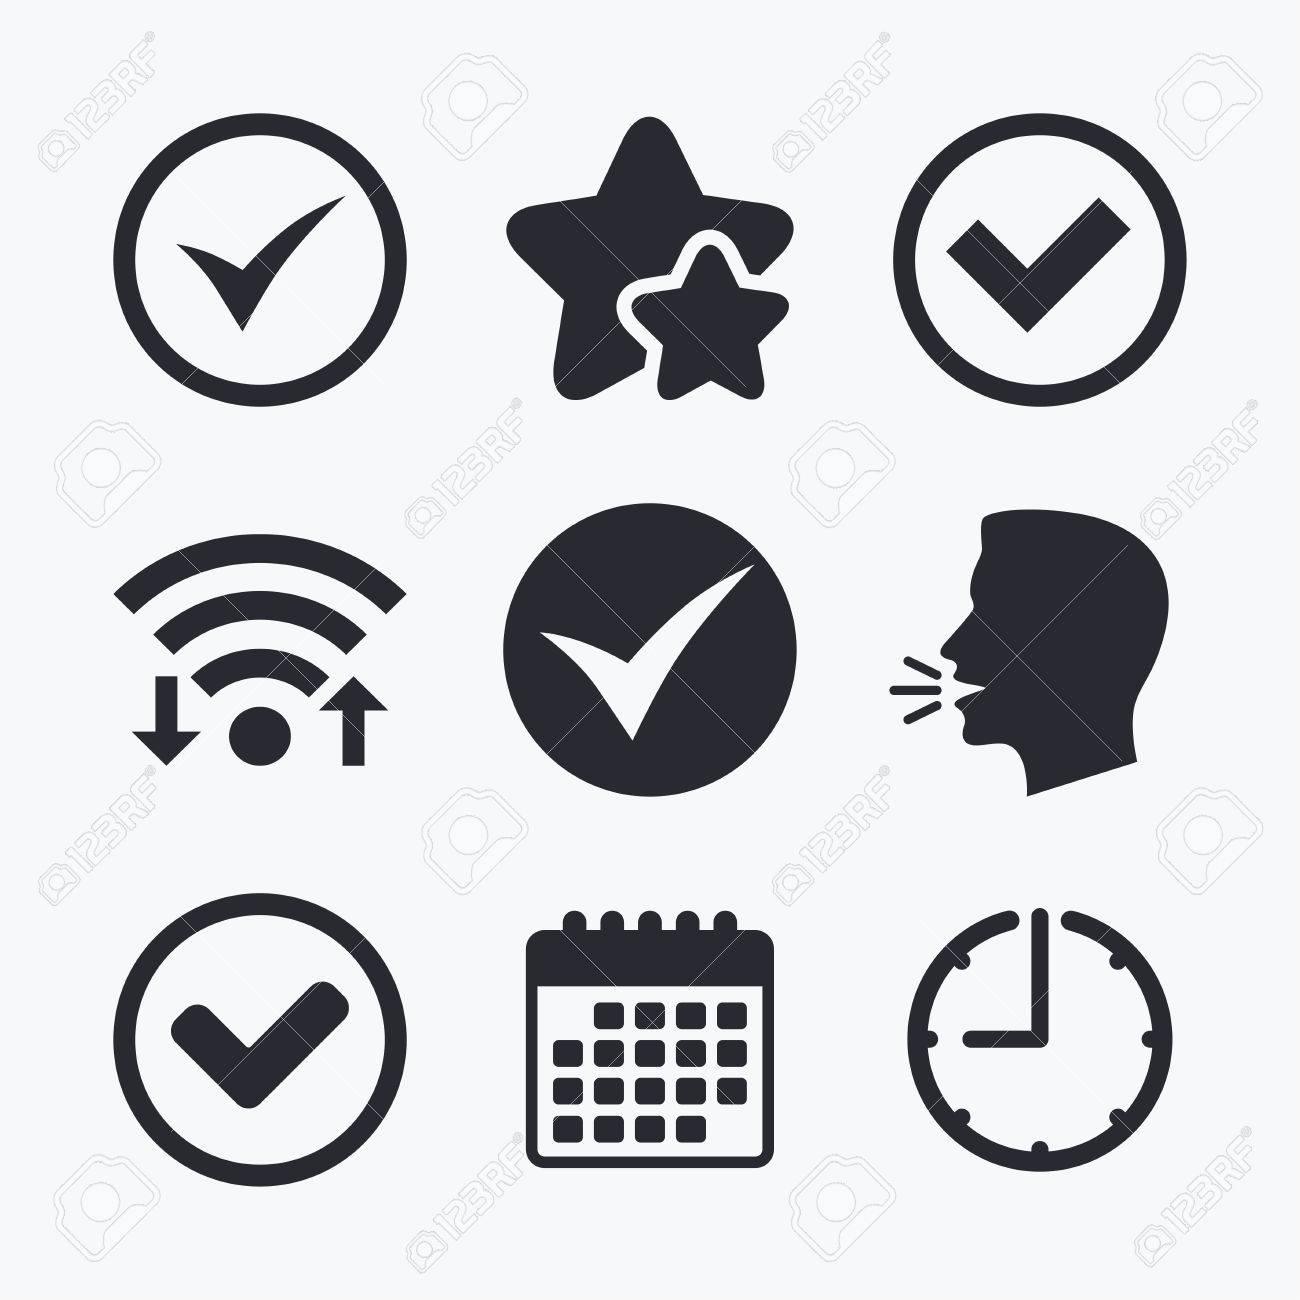 check icons checkbox confirm circle sign symbols wifi internet